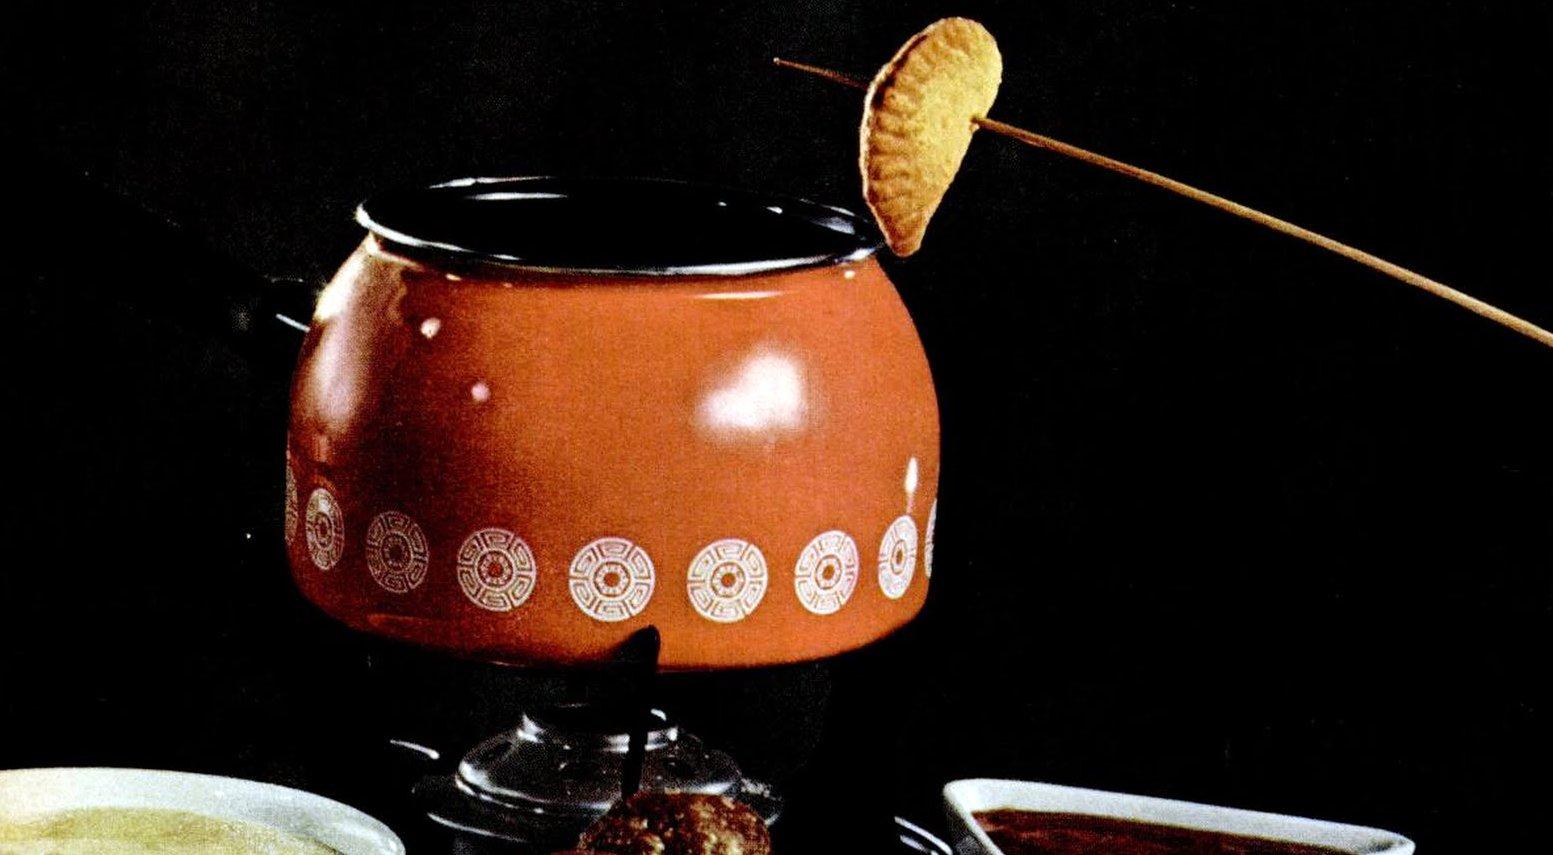 1969 Fondue fun recipes